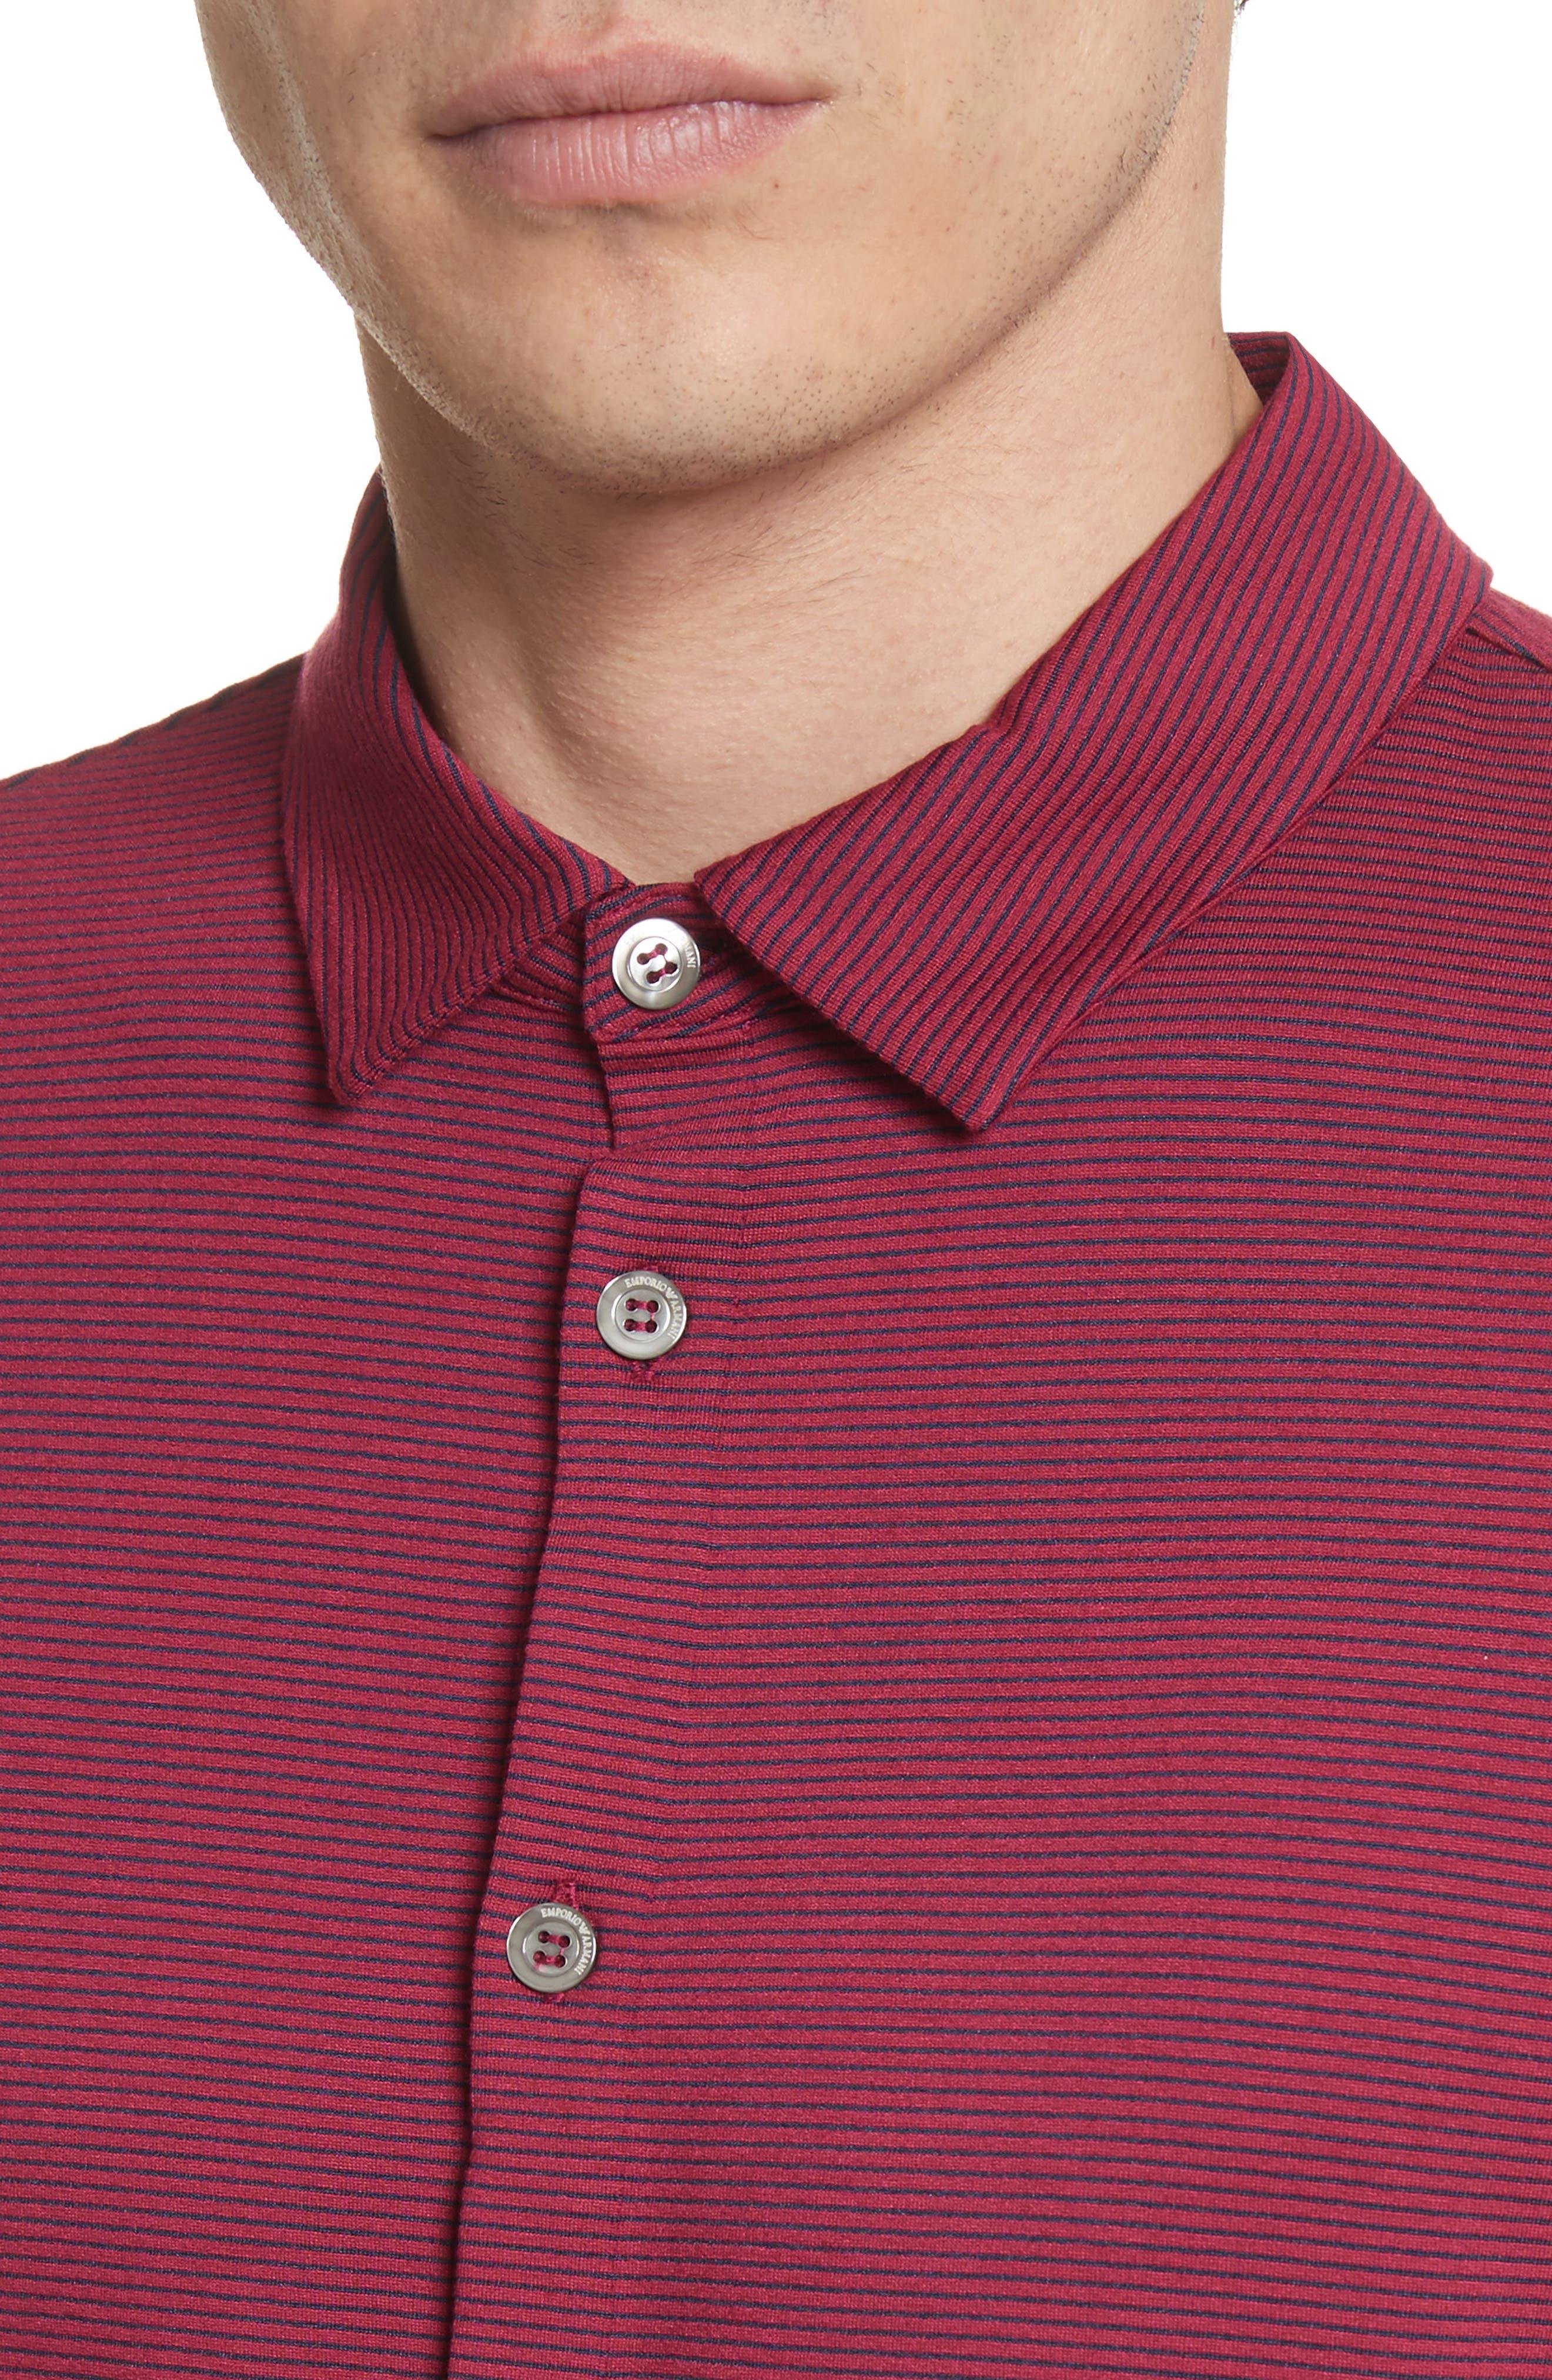 Slim Fit Knit Shirt,                             Alternate thumbnail 4, color,                             930